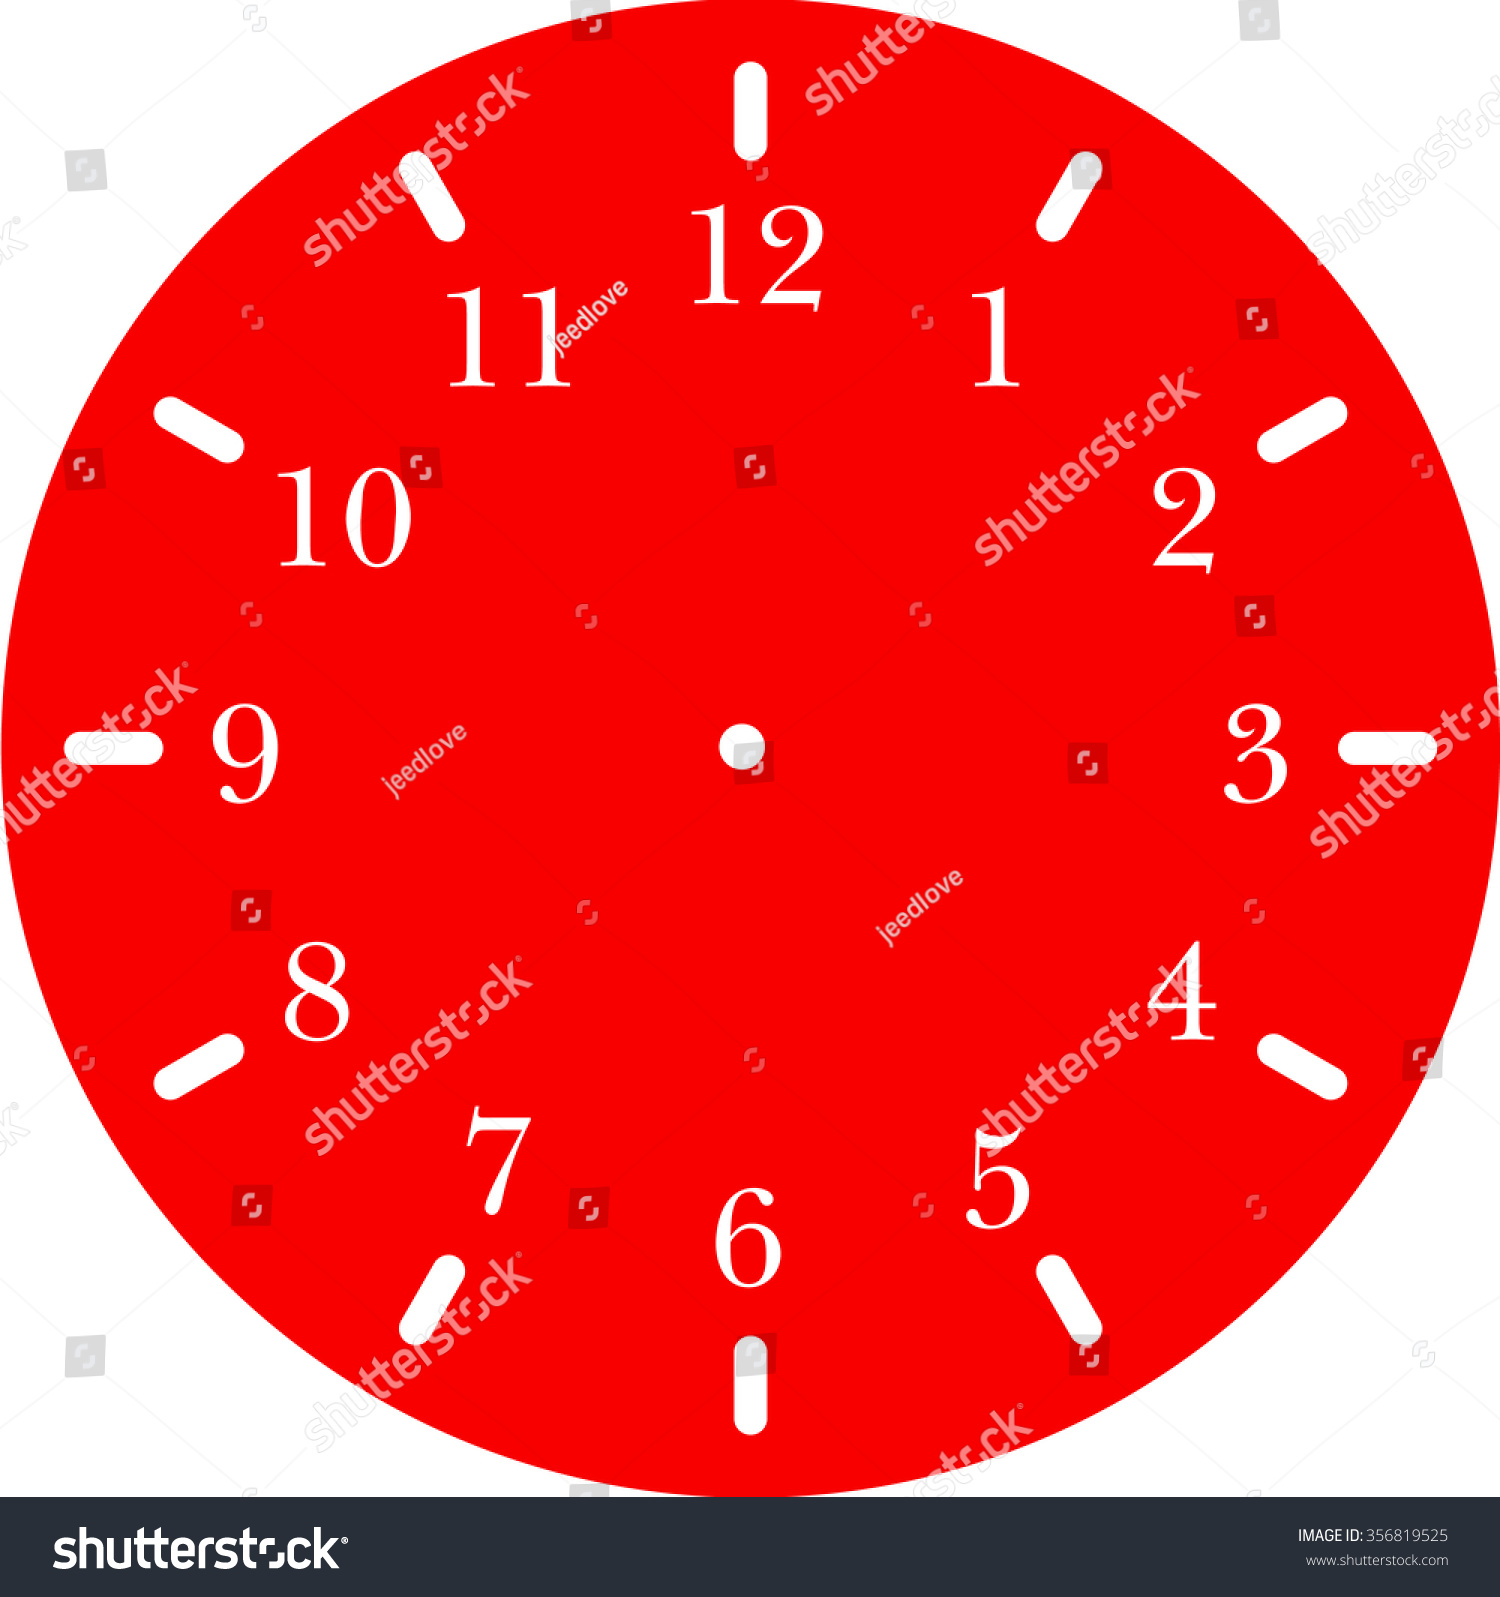 worksheet Blank Analog Clock Face clock face blank stock vector 356819525 shutterstock blank